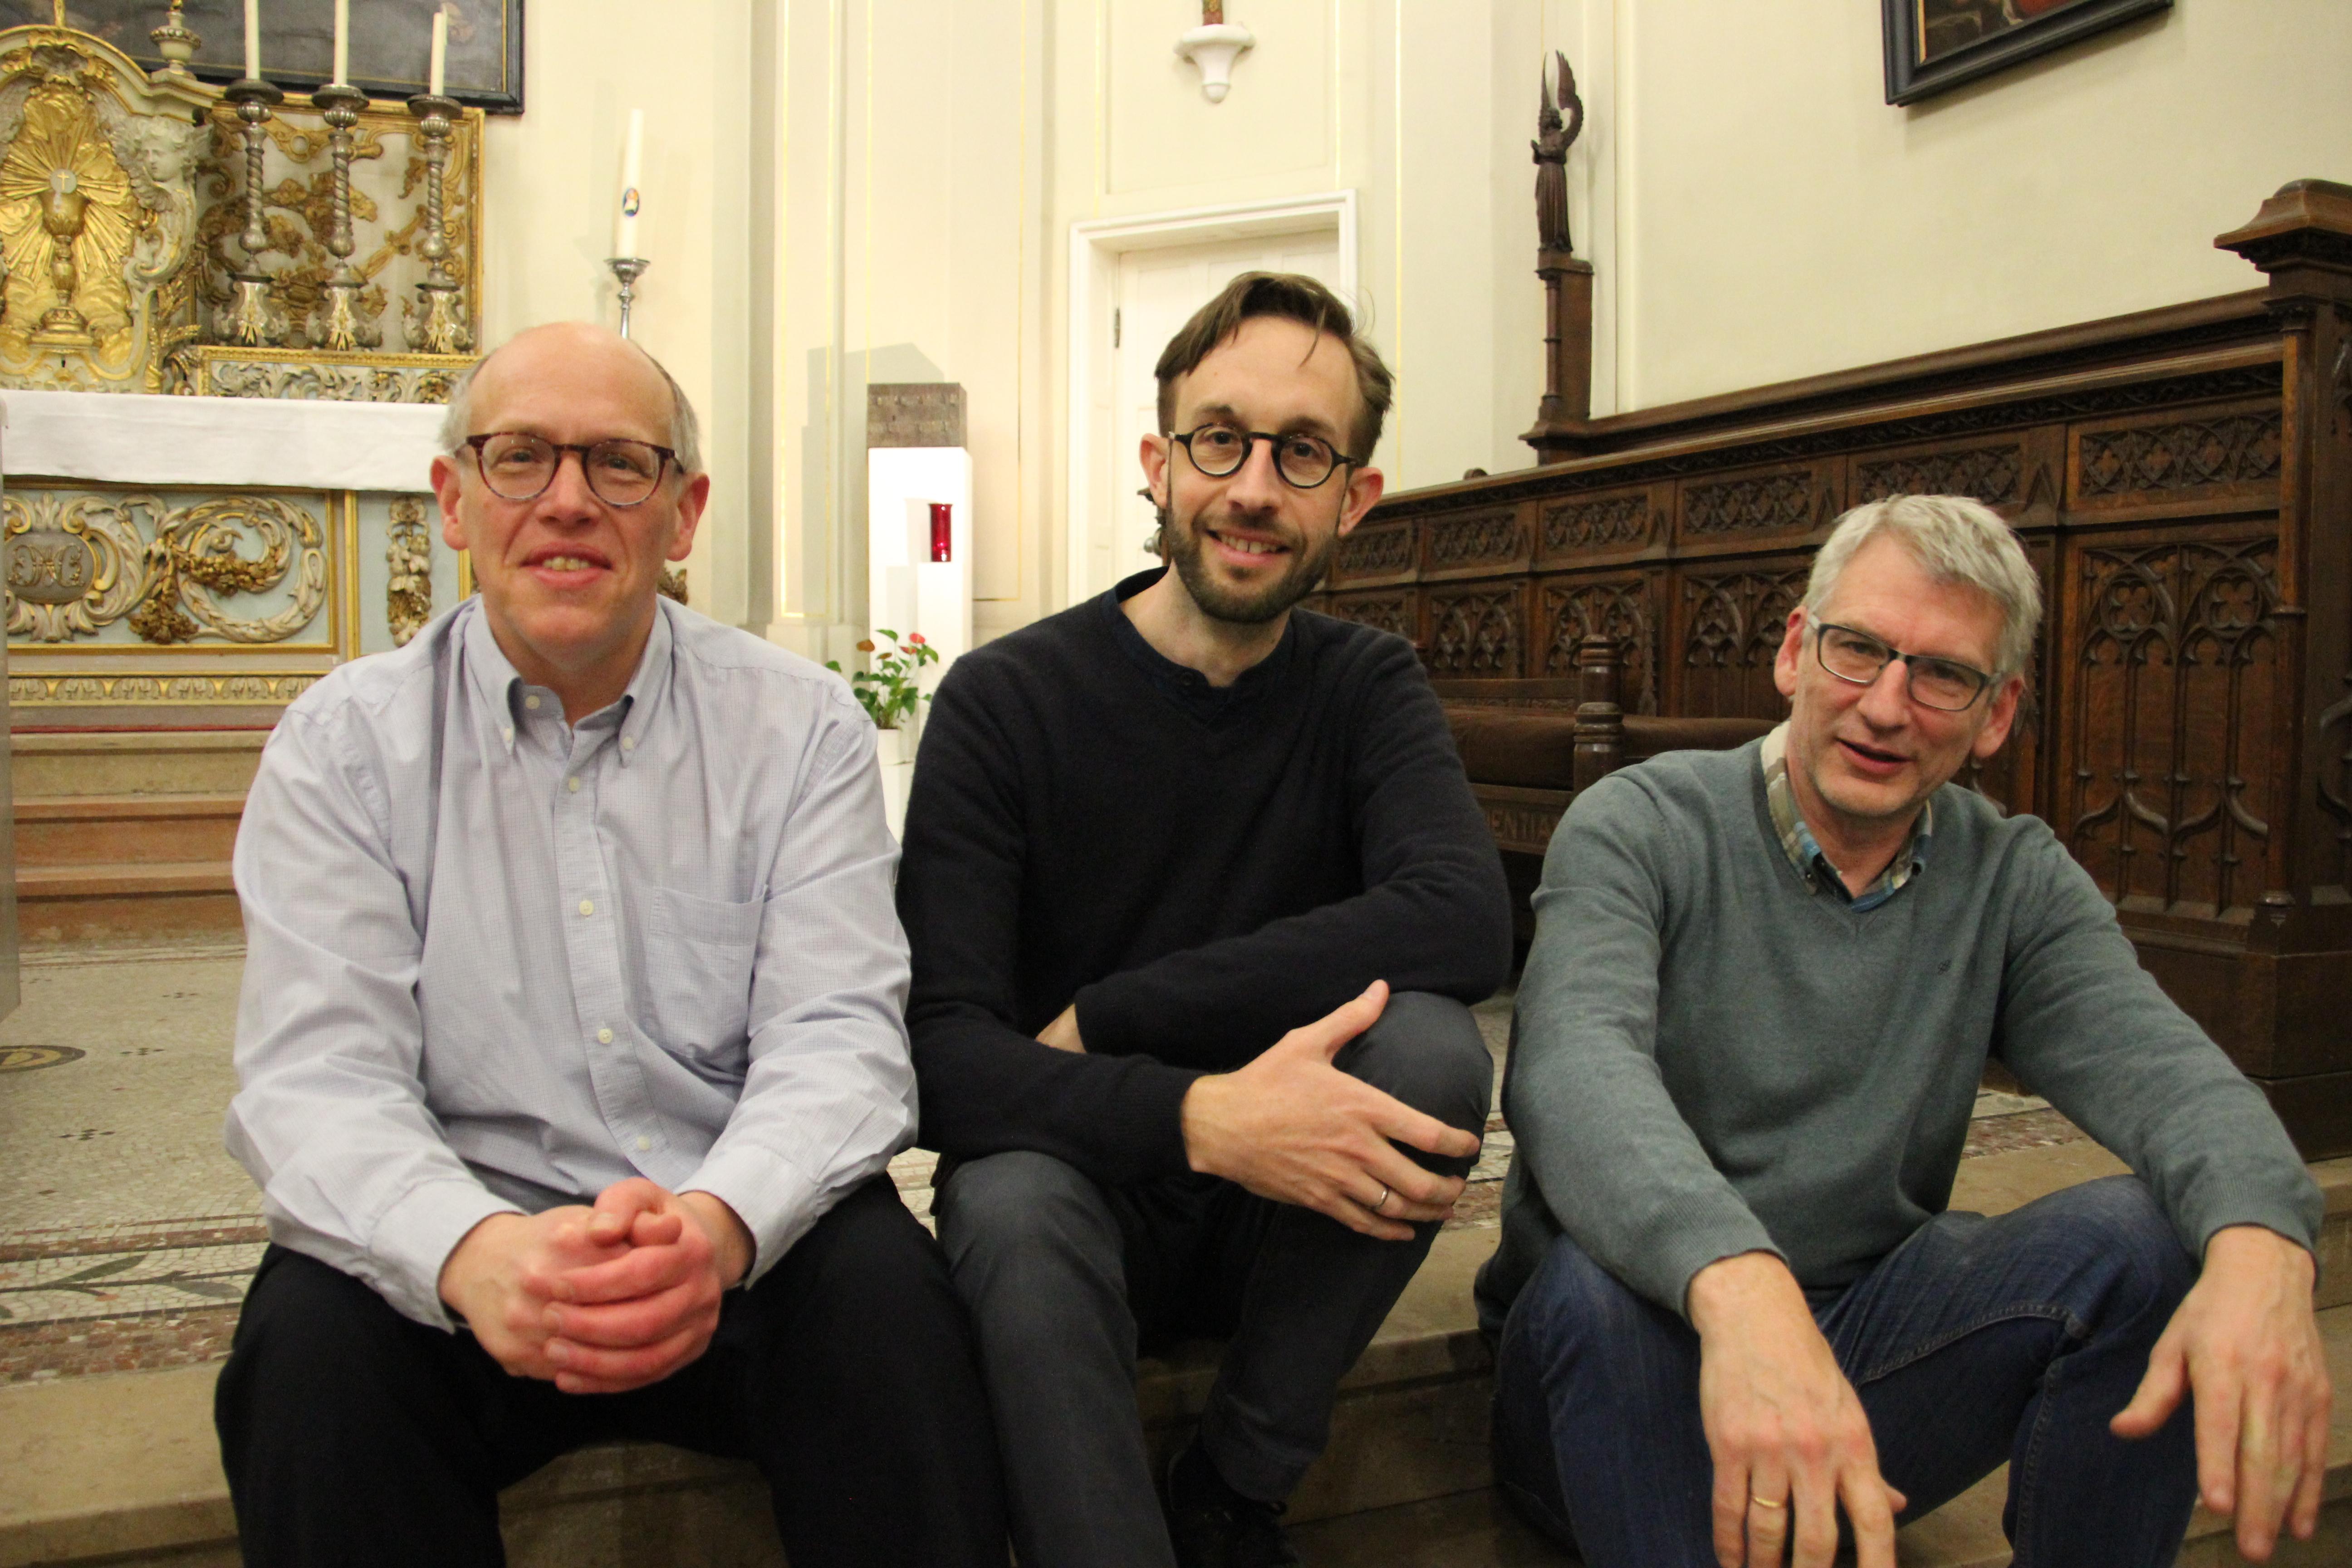 Drie nieuwe permanente diakens voor het aartsbisdom © Tim Peeters